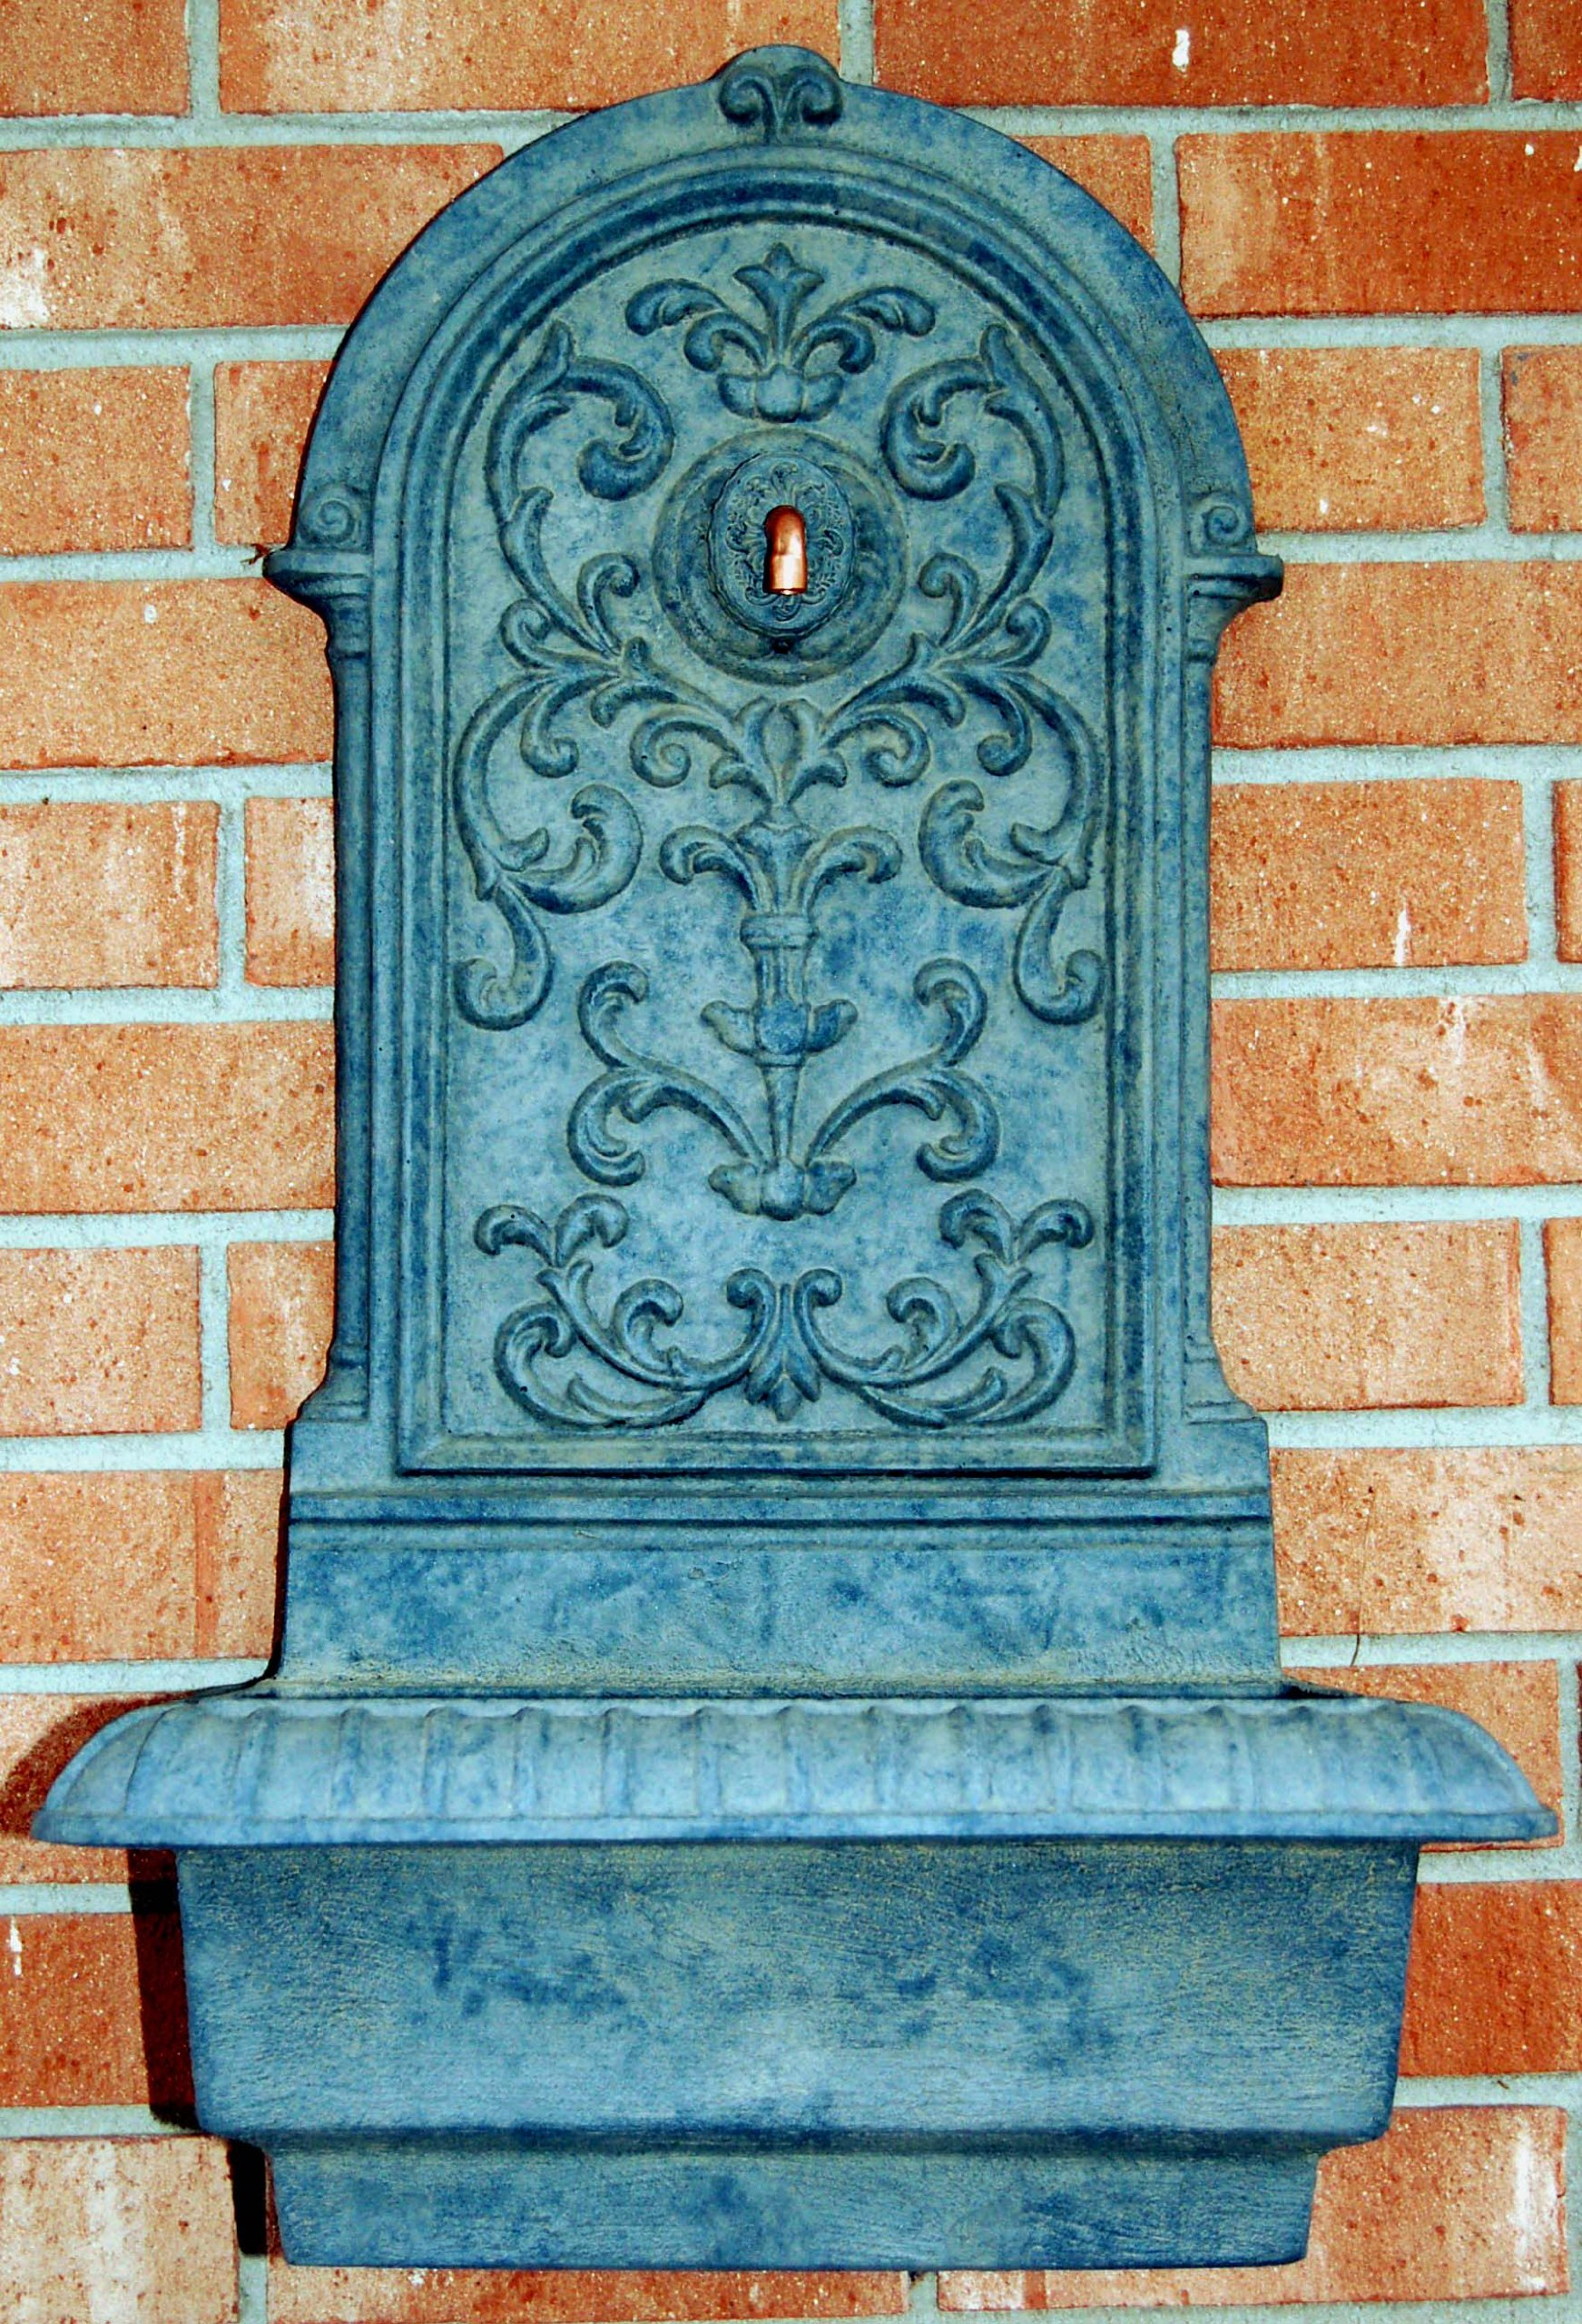 Ladybug Renaissance Wall Fountain, Lead by Ladybug